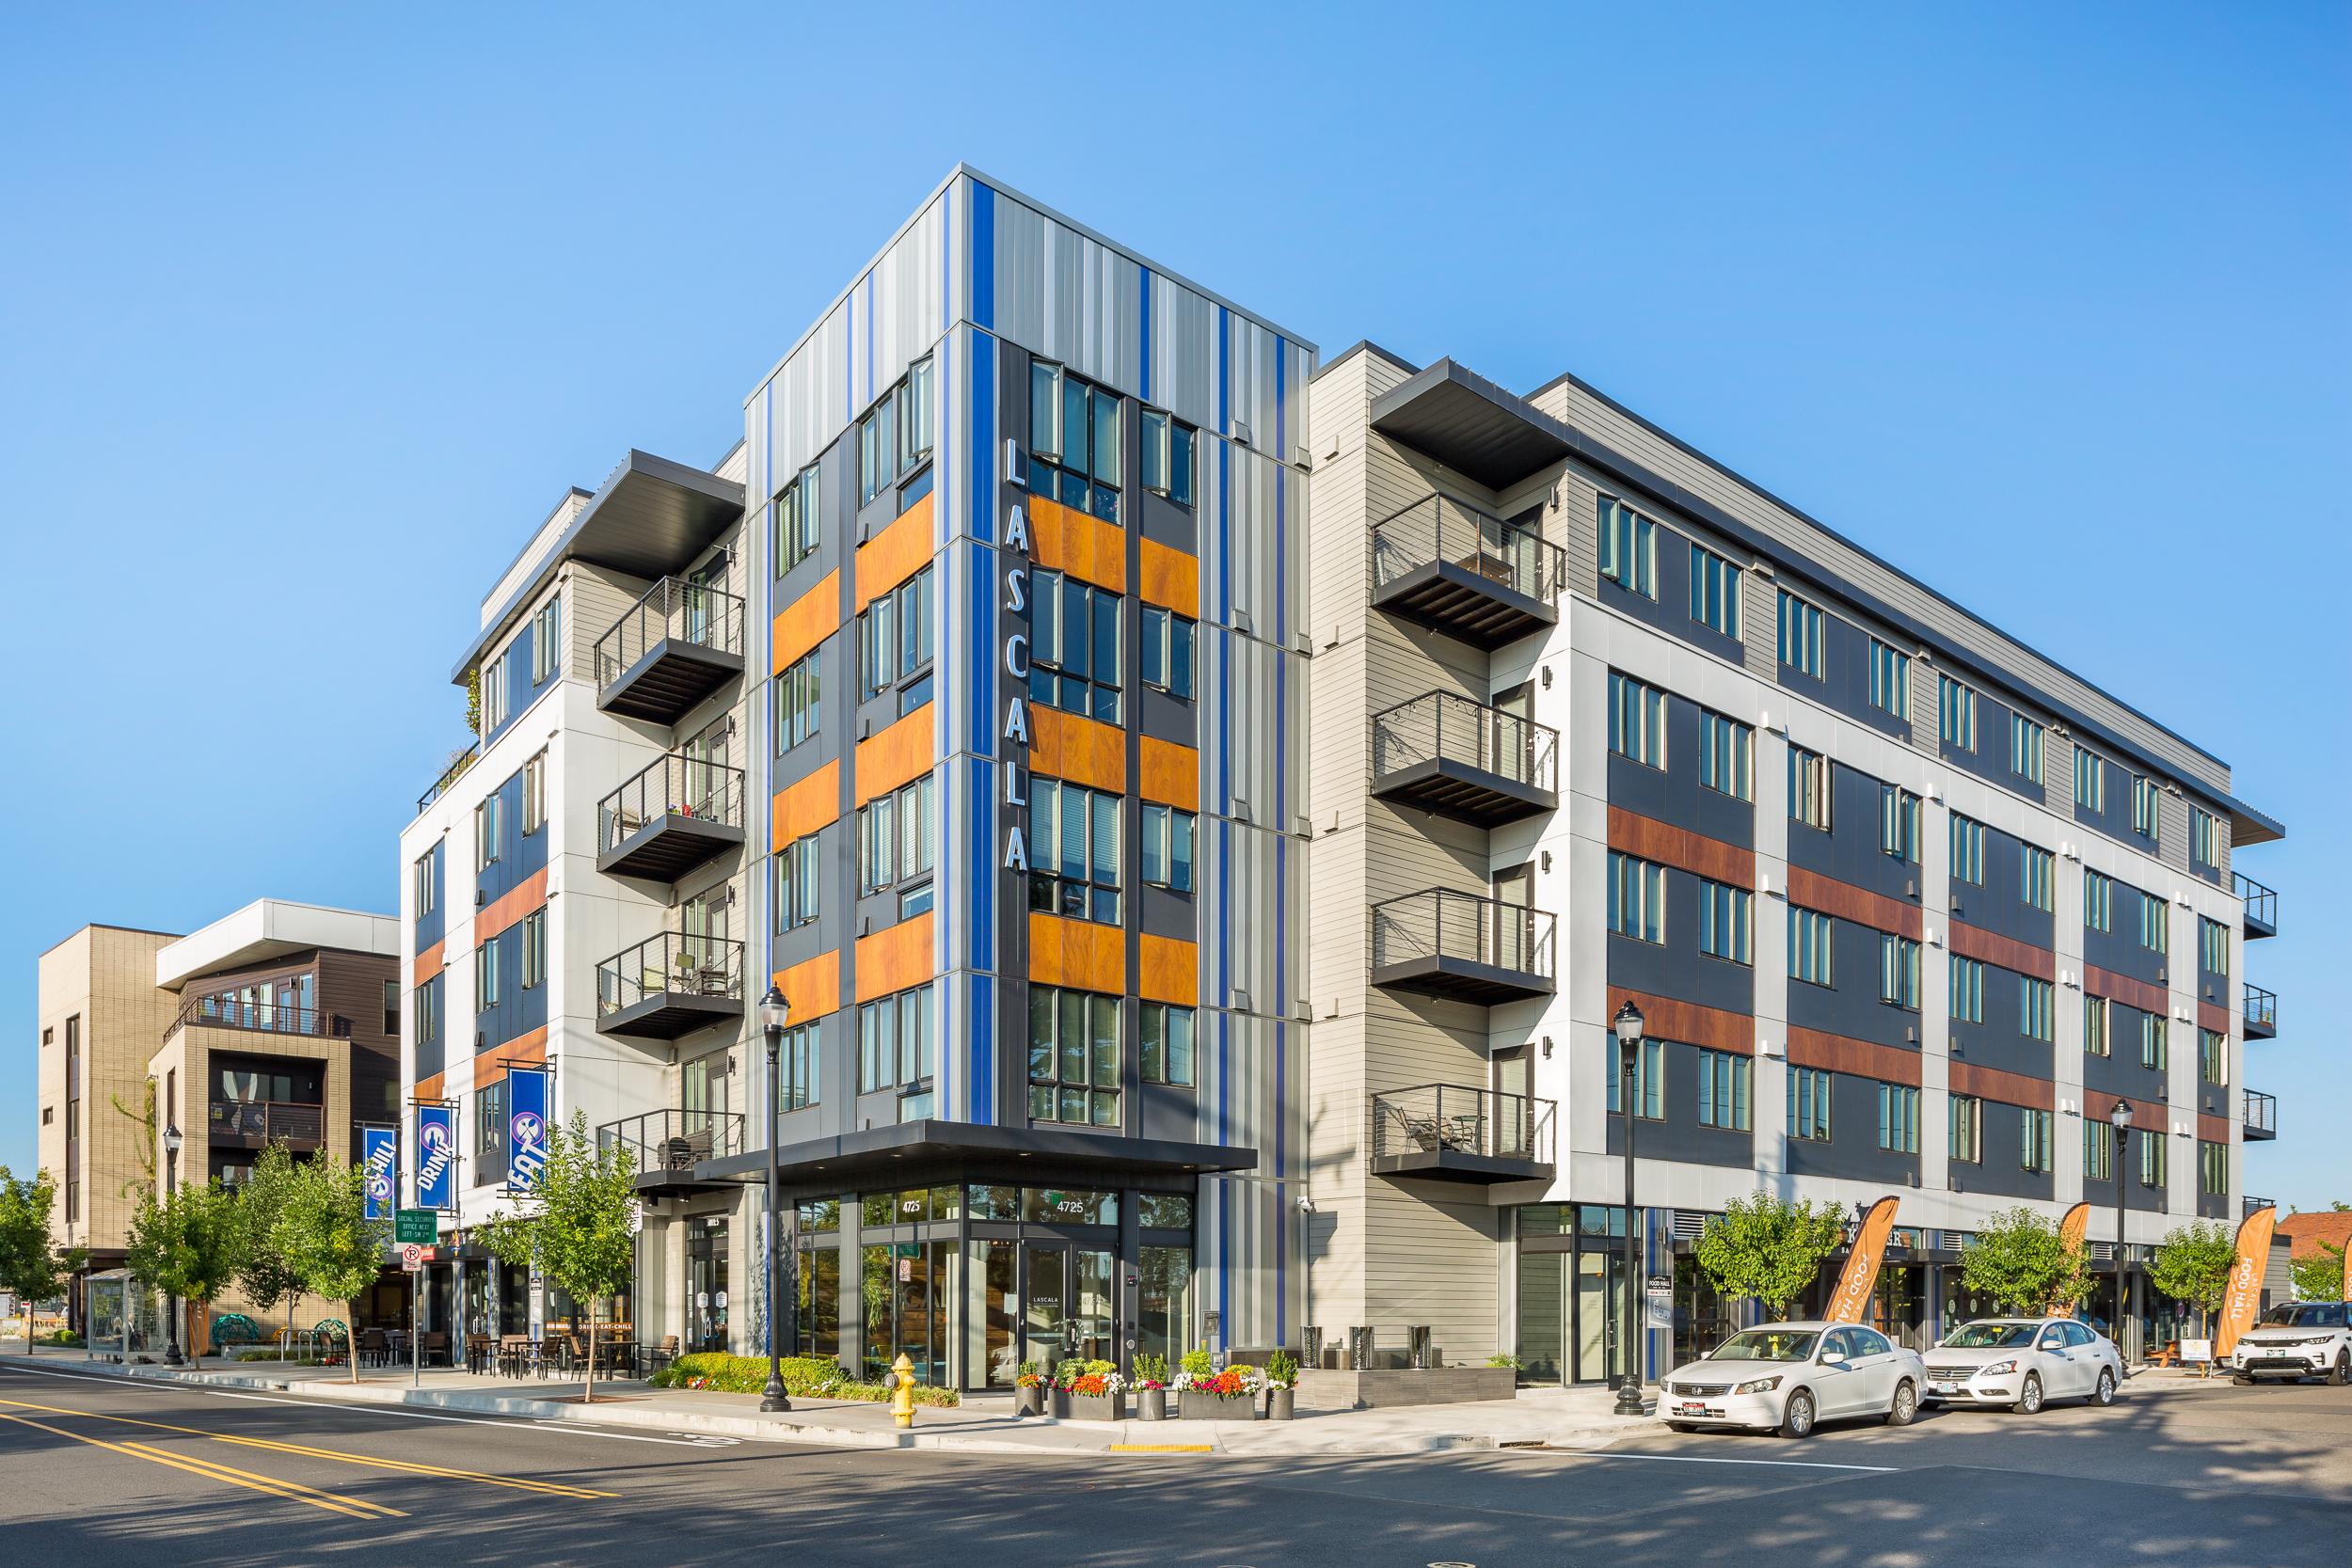 LaScala / Carleton Hart Architecture